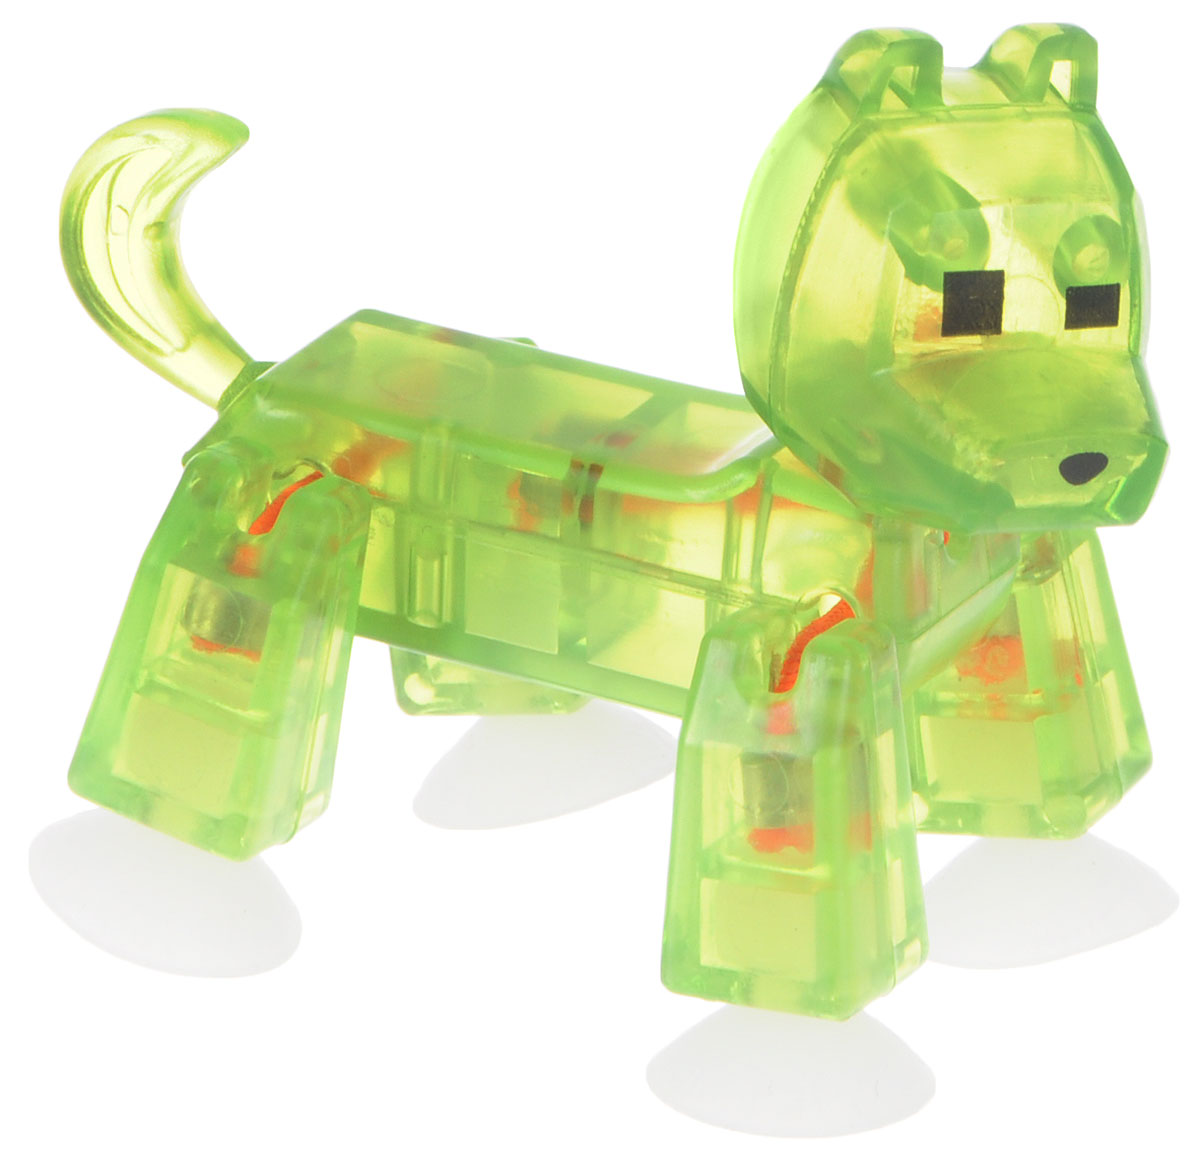 Stikbot Фигурка Питомцы Пес цвет зеленый stikbot фигурка питомцы бульдог красный